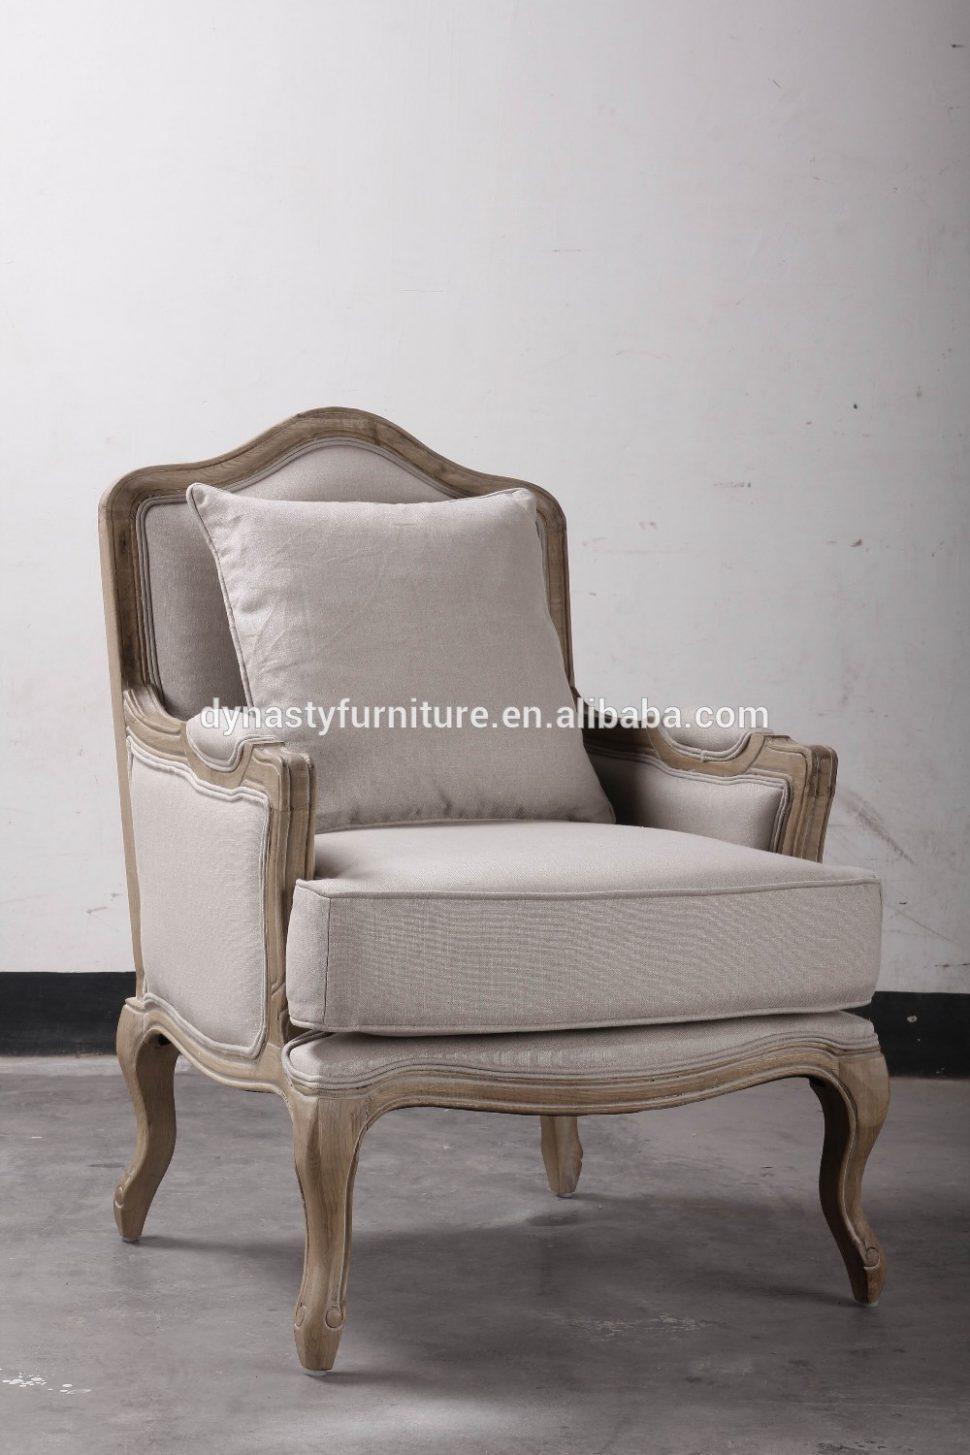 Sofas Center : Fancy Sofa Sets Set Wood Furniture Singular Photo Pertaining To Fancy Sofas (Image 18 of 20)